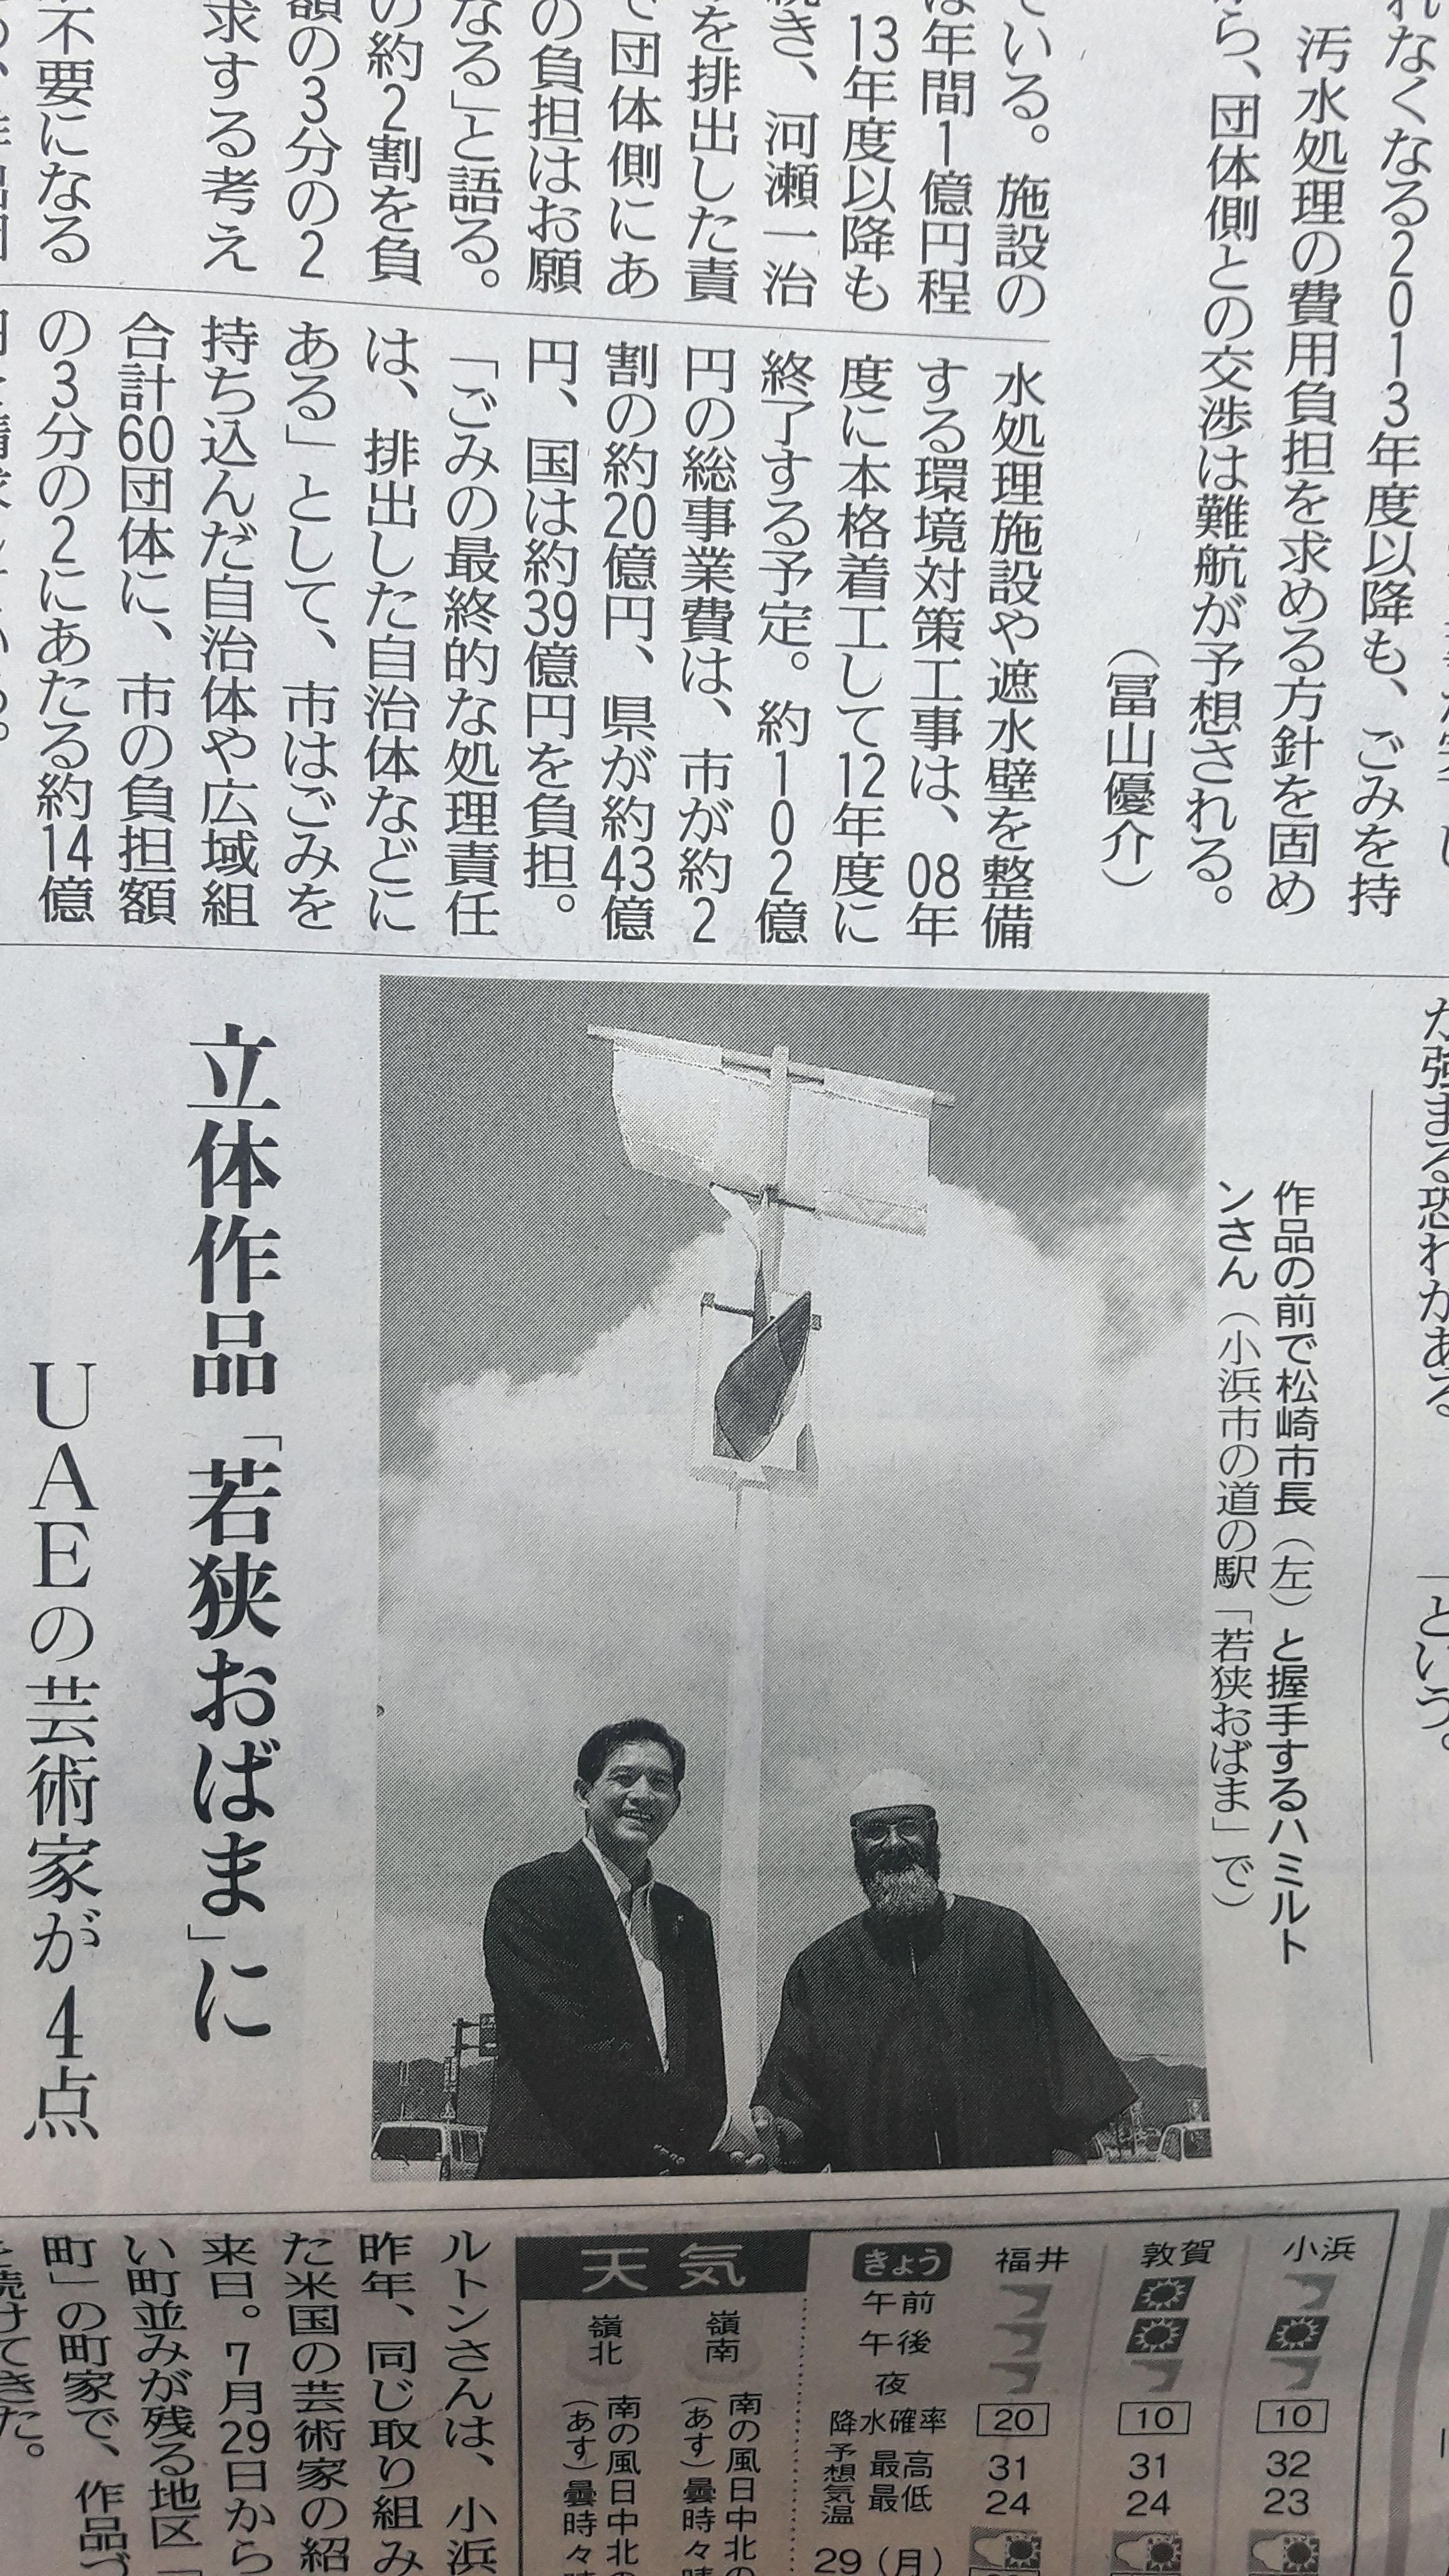 Japan 2011 Newspaper